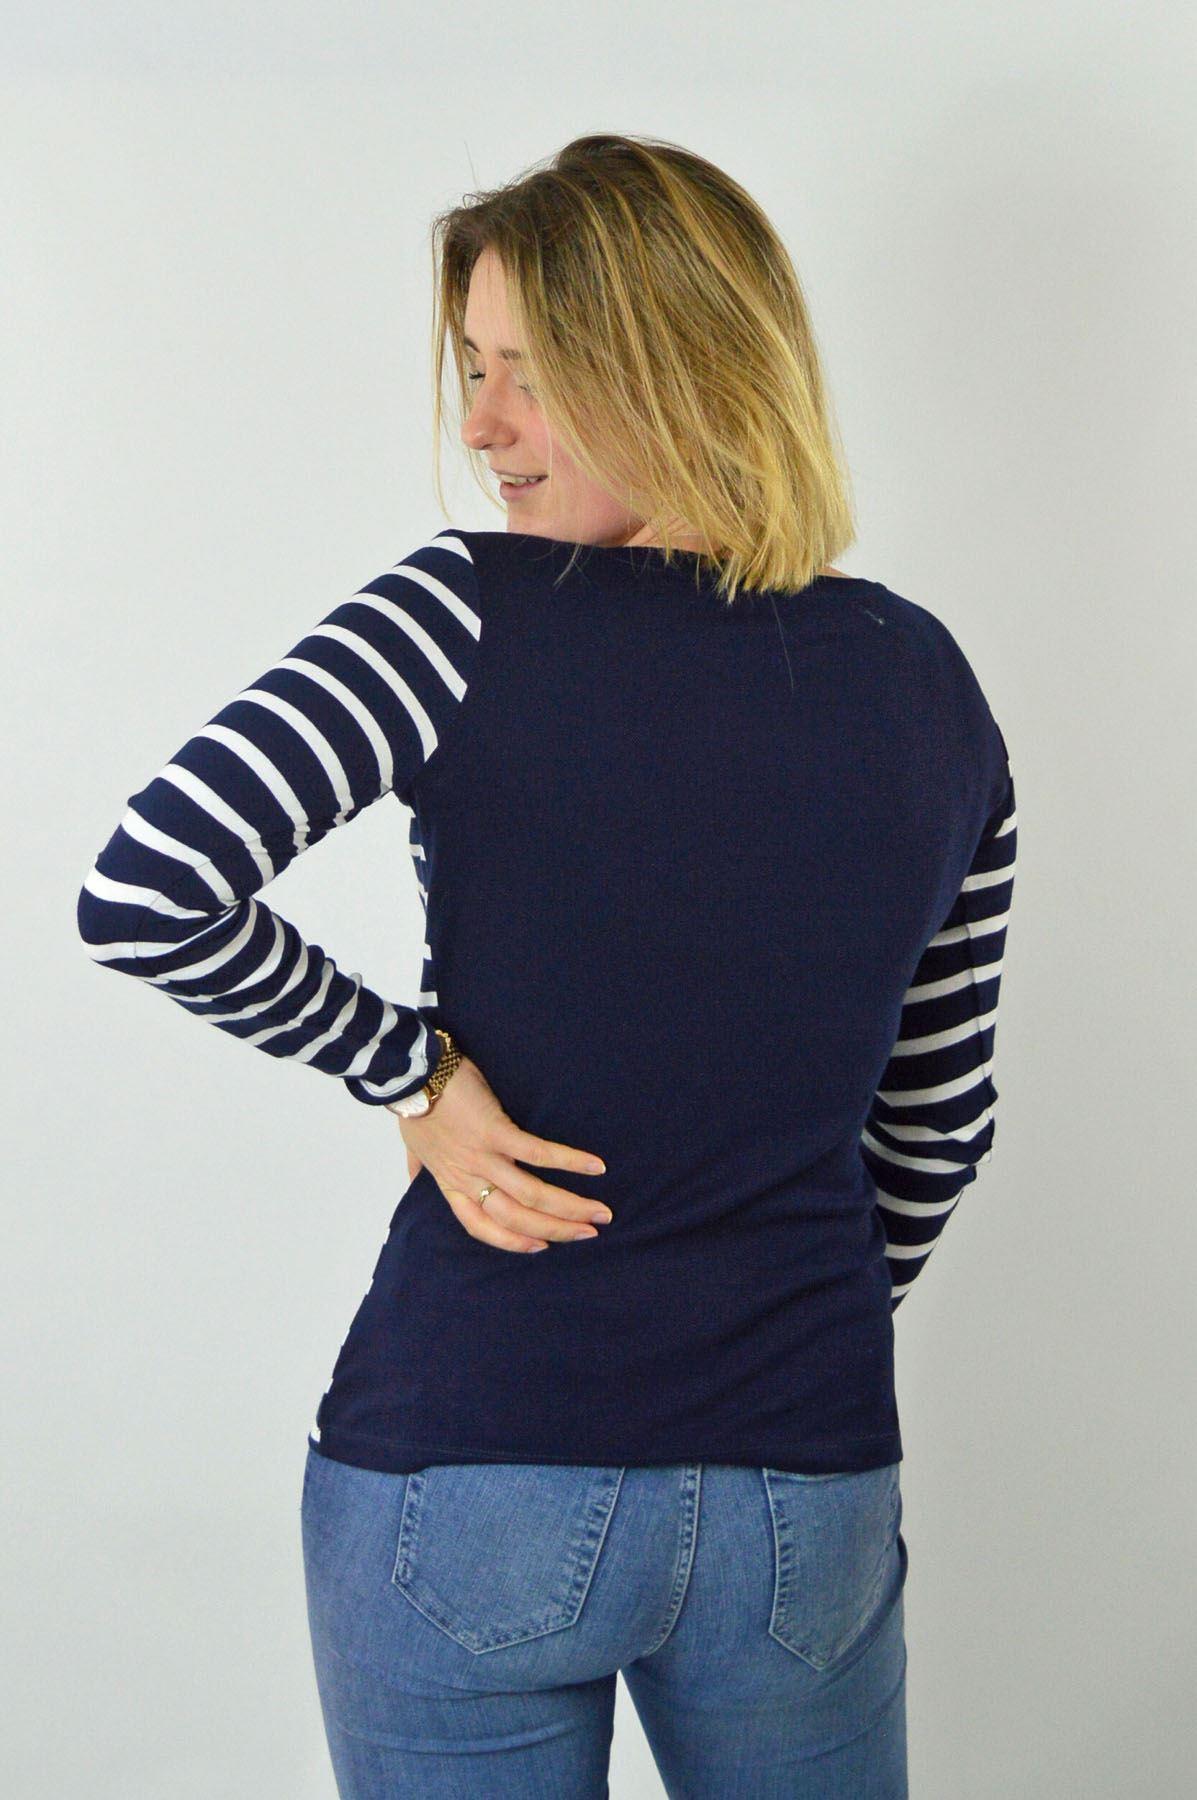 Womens-Crew-Neck-Navy-Black-White-Striped-Jersey-Top-Long-Sleeve-T-Shirt thumbnail 12